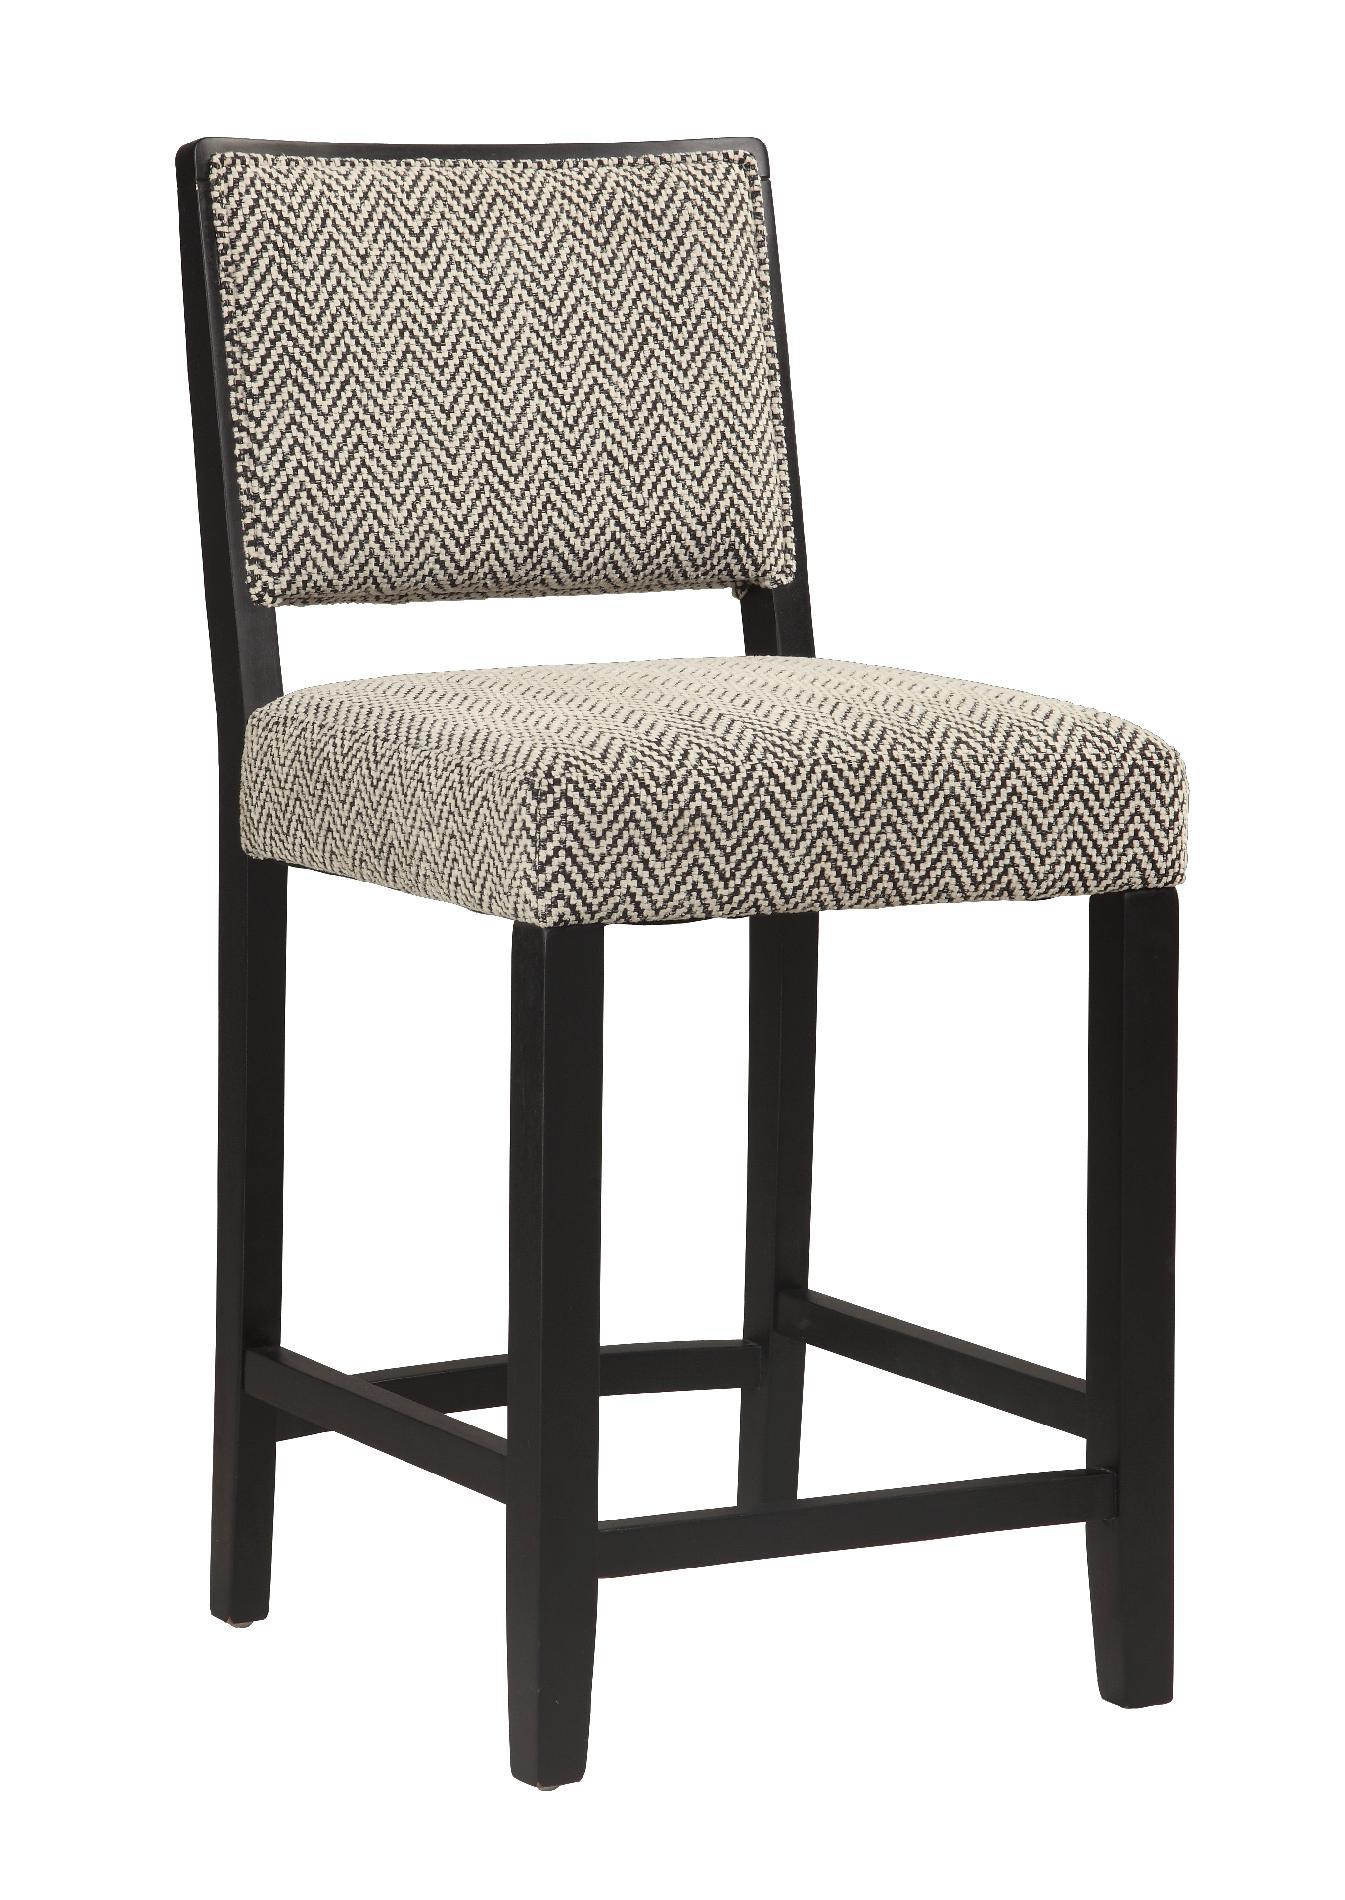 Linon Zoe Counter Stool Bridgeport Home Furniture